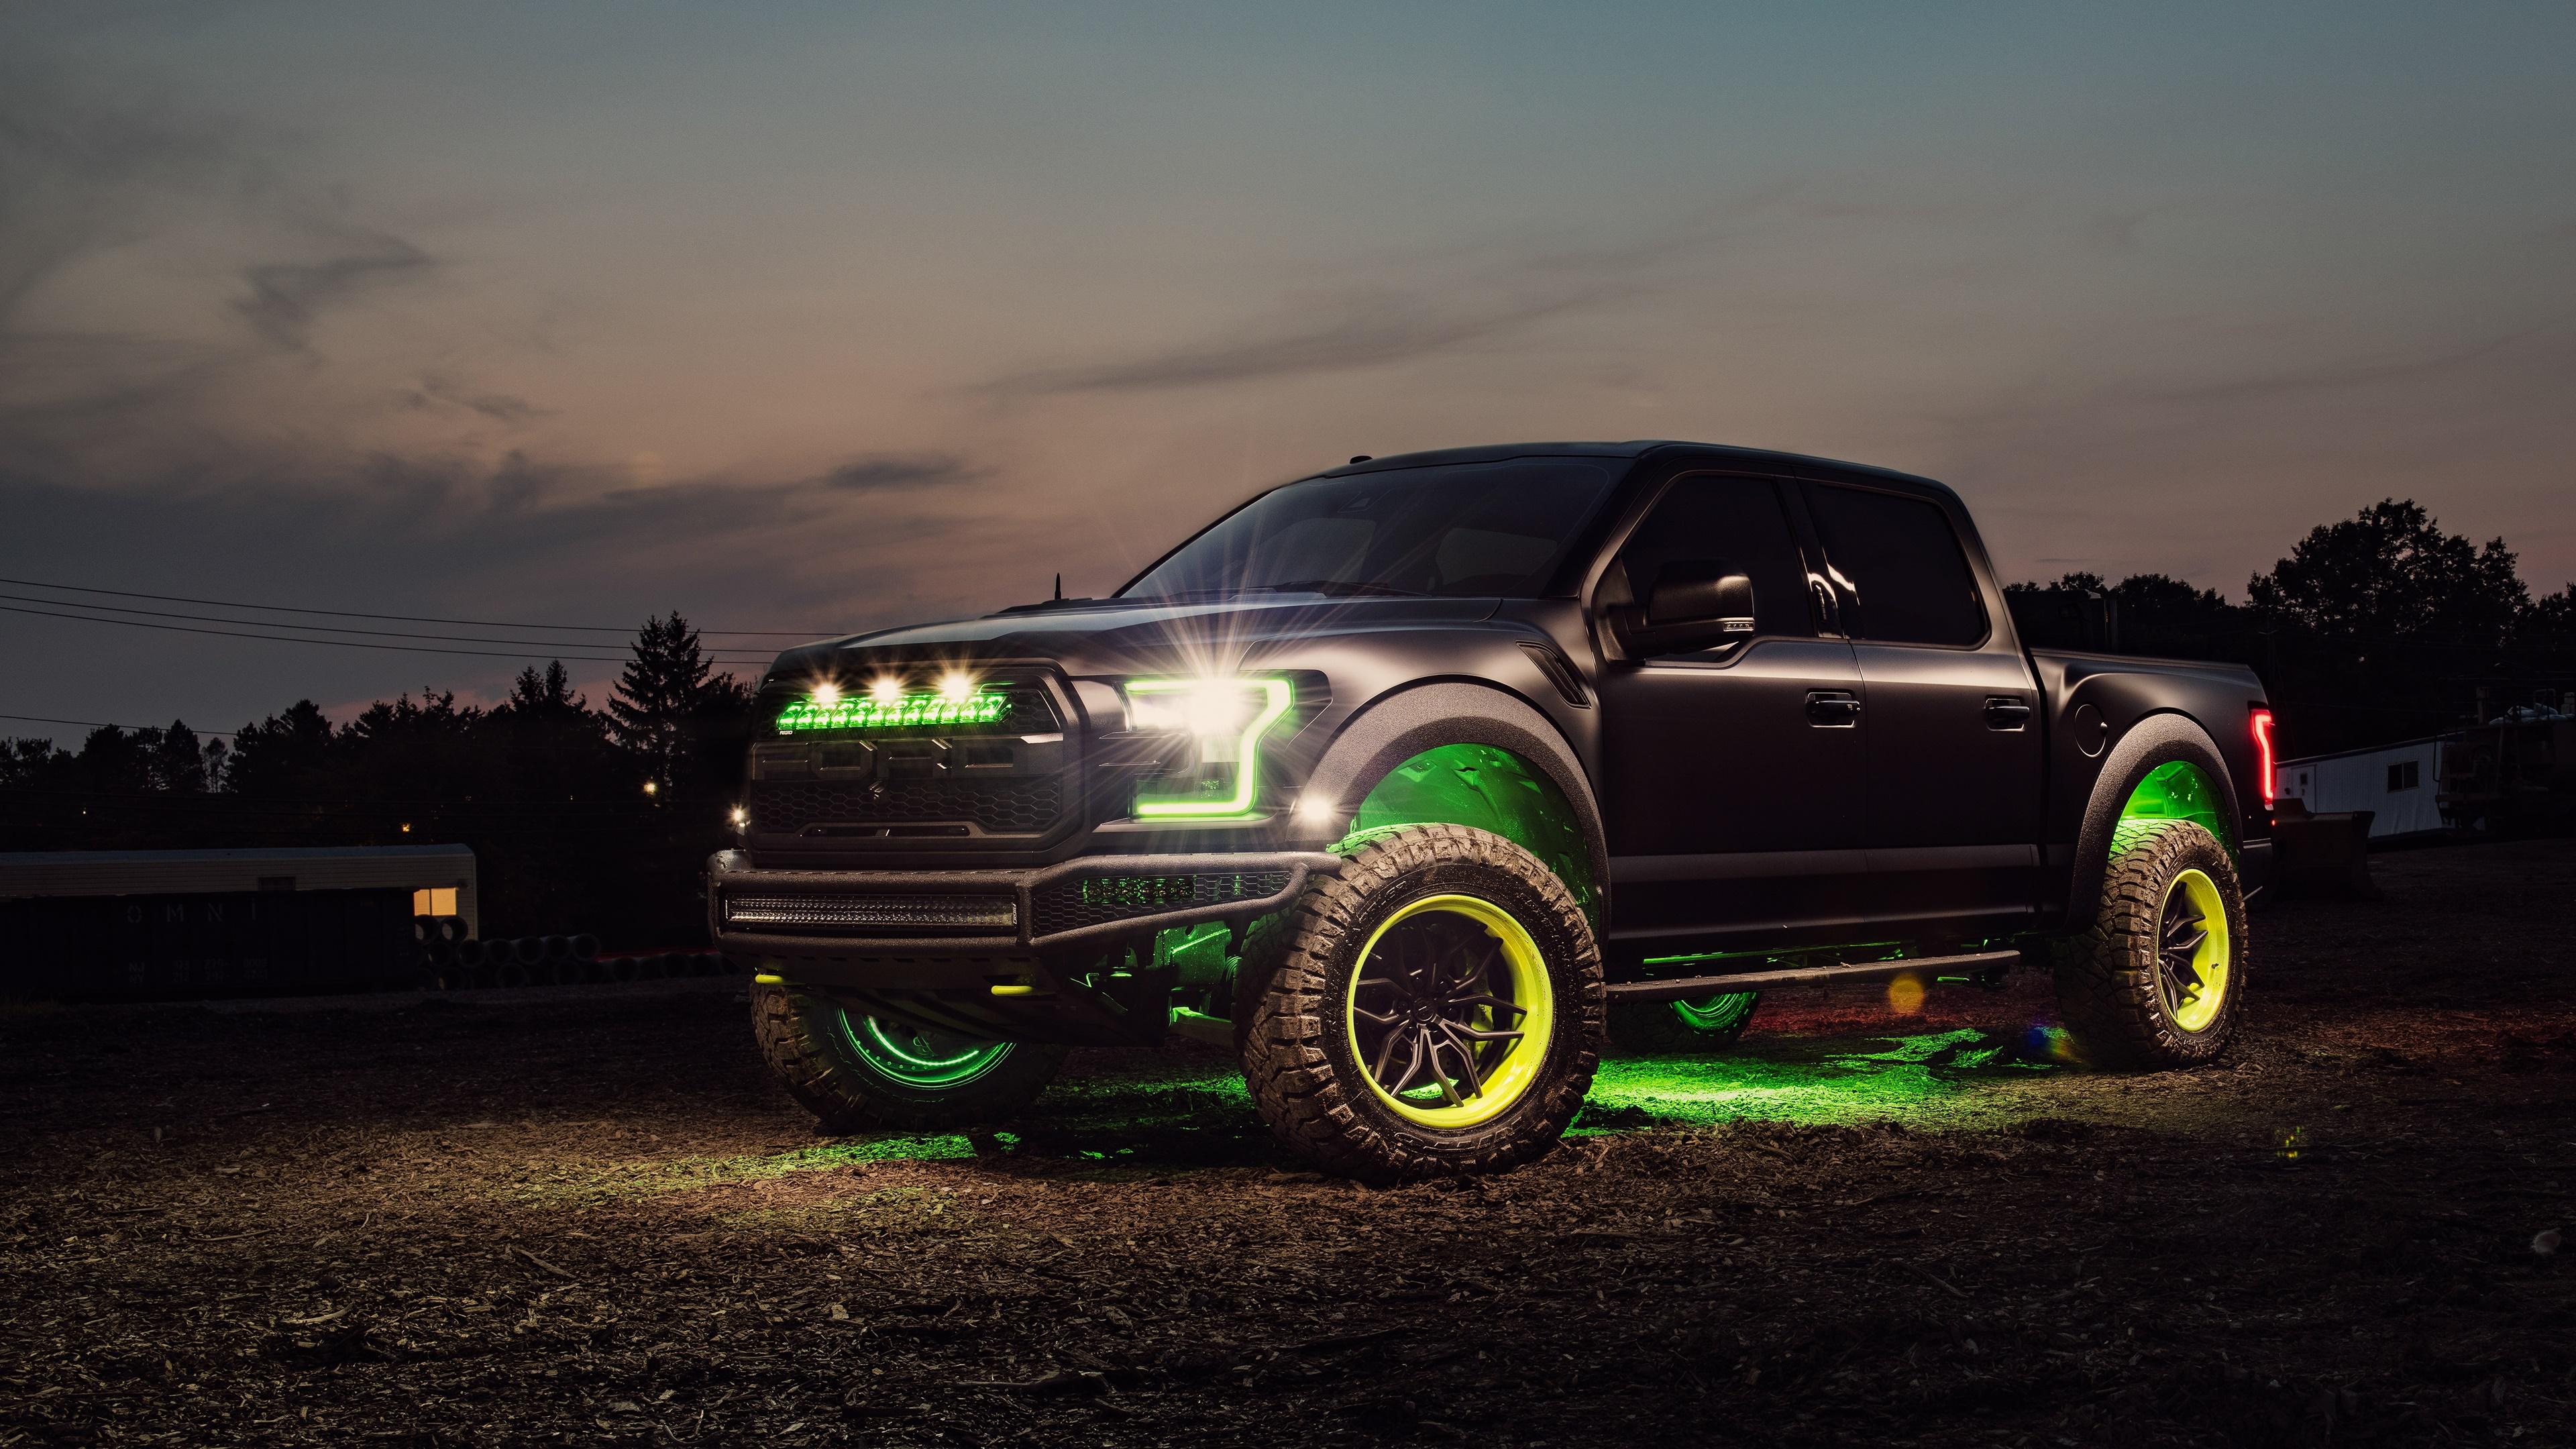 Ford F150 Raptor wallpaper